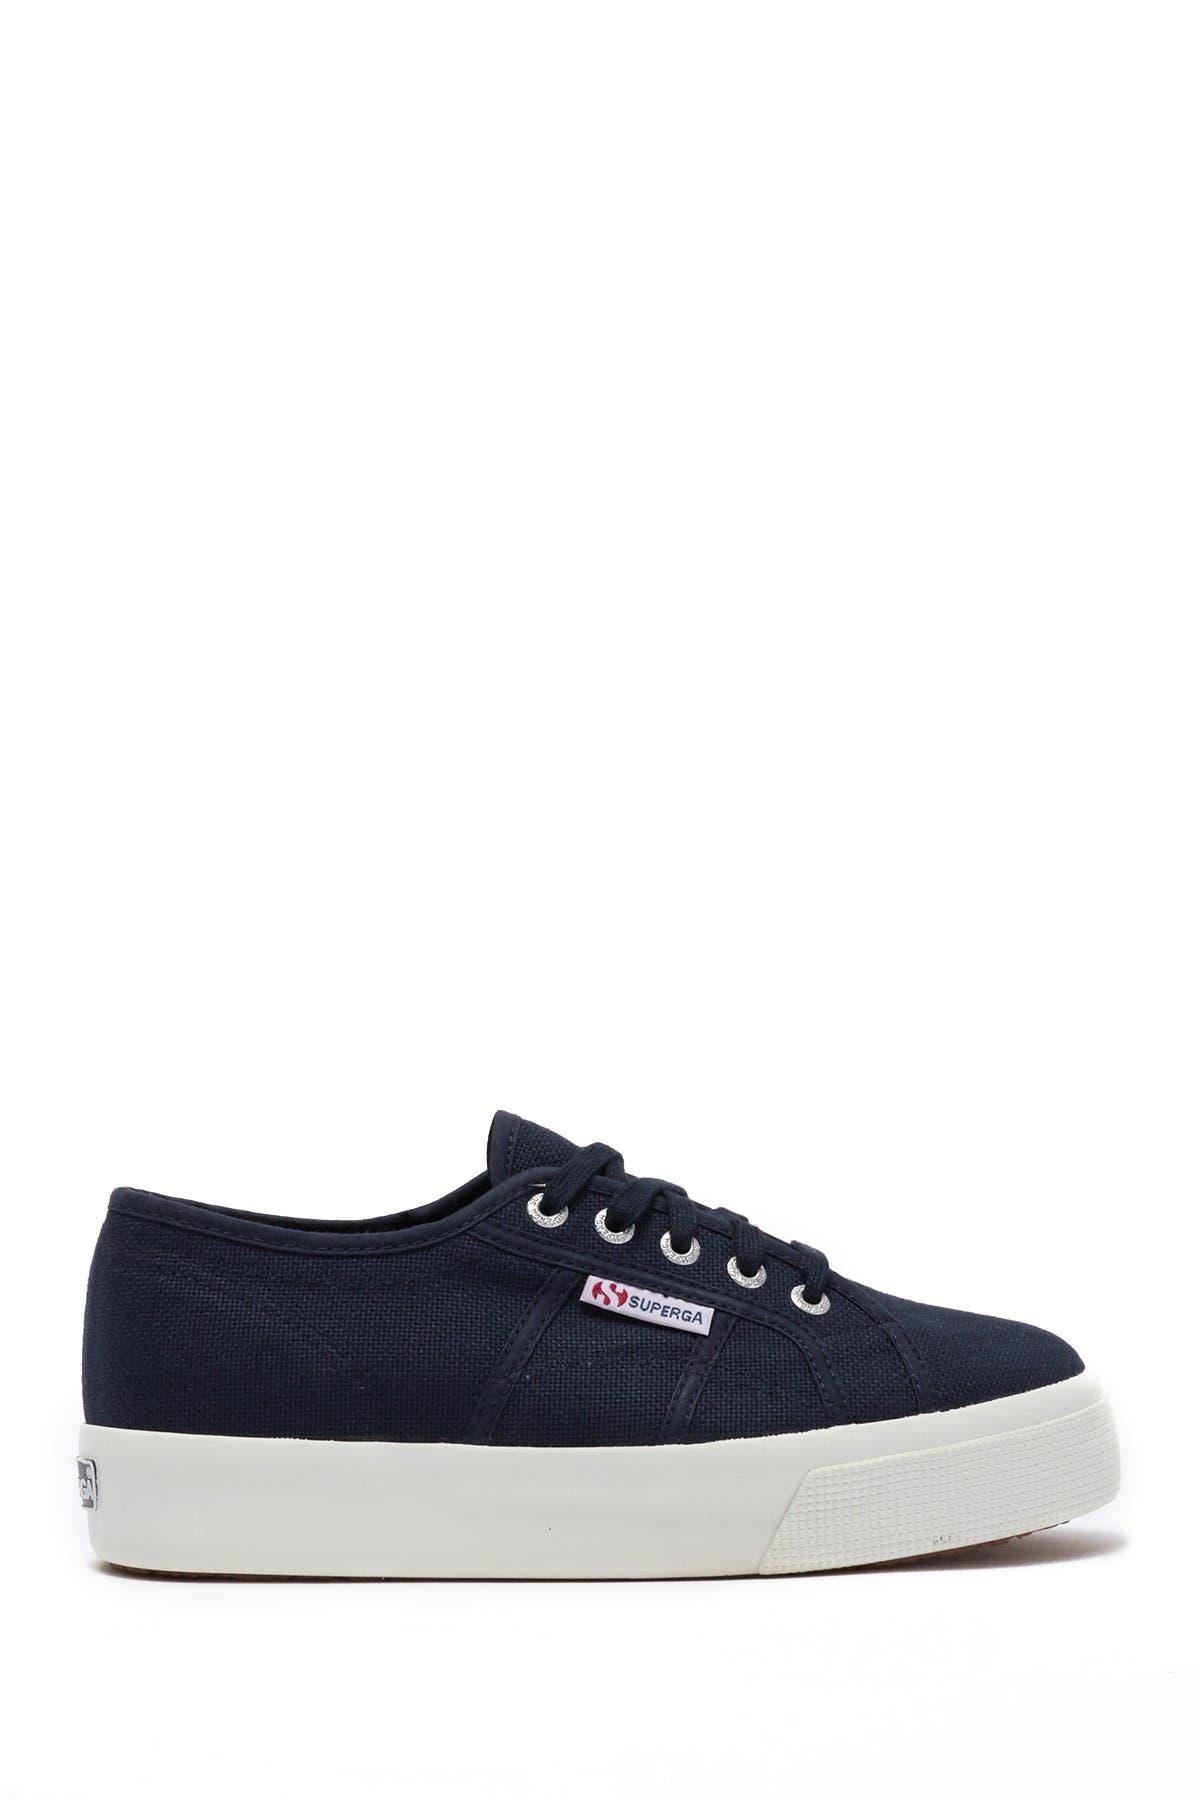 Superga | Cotu Platform Sneaker